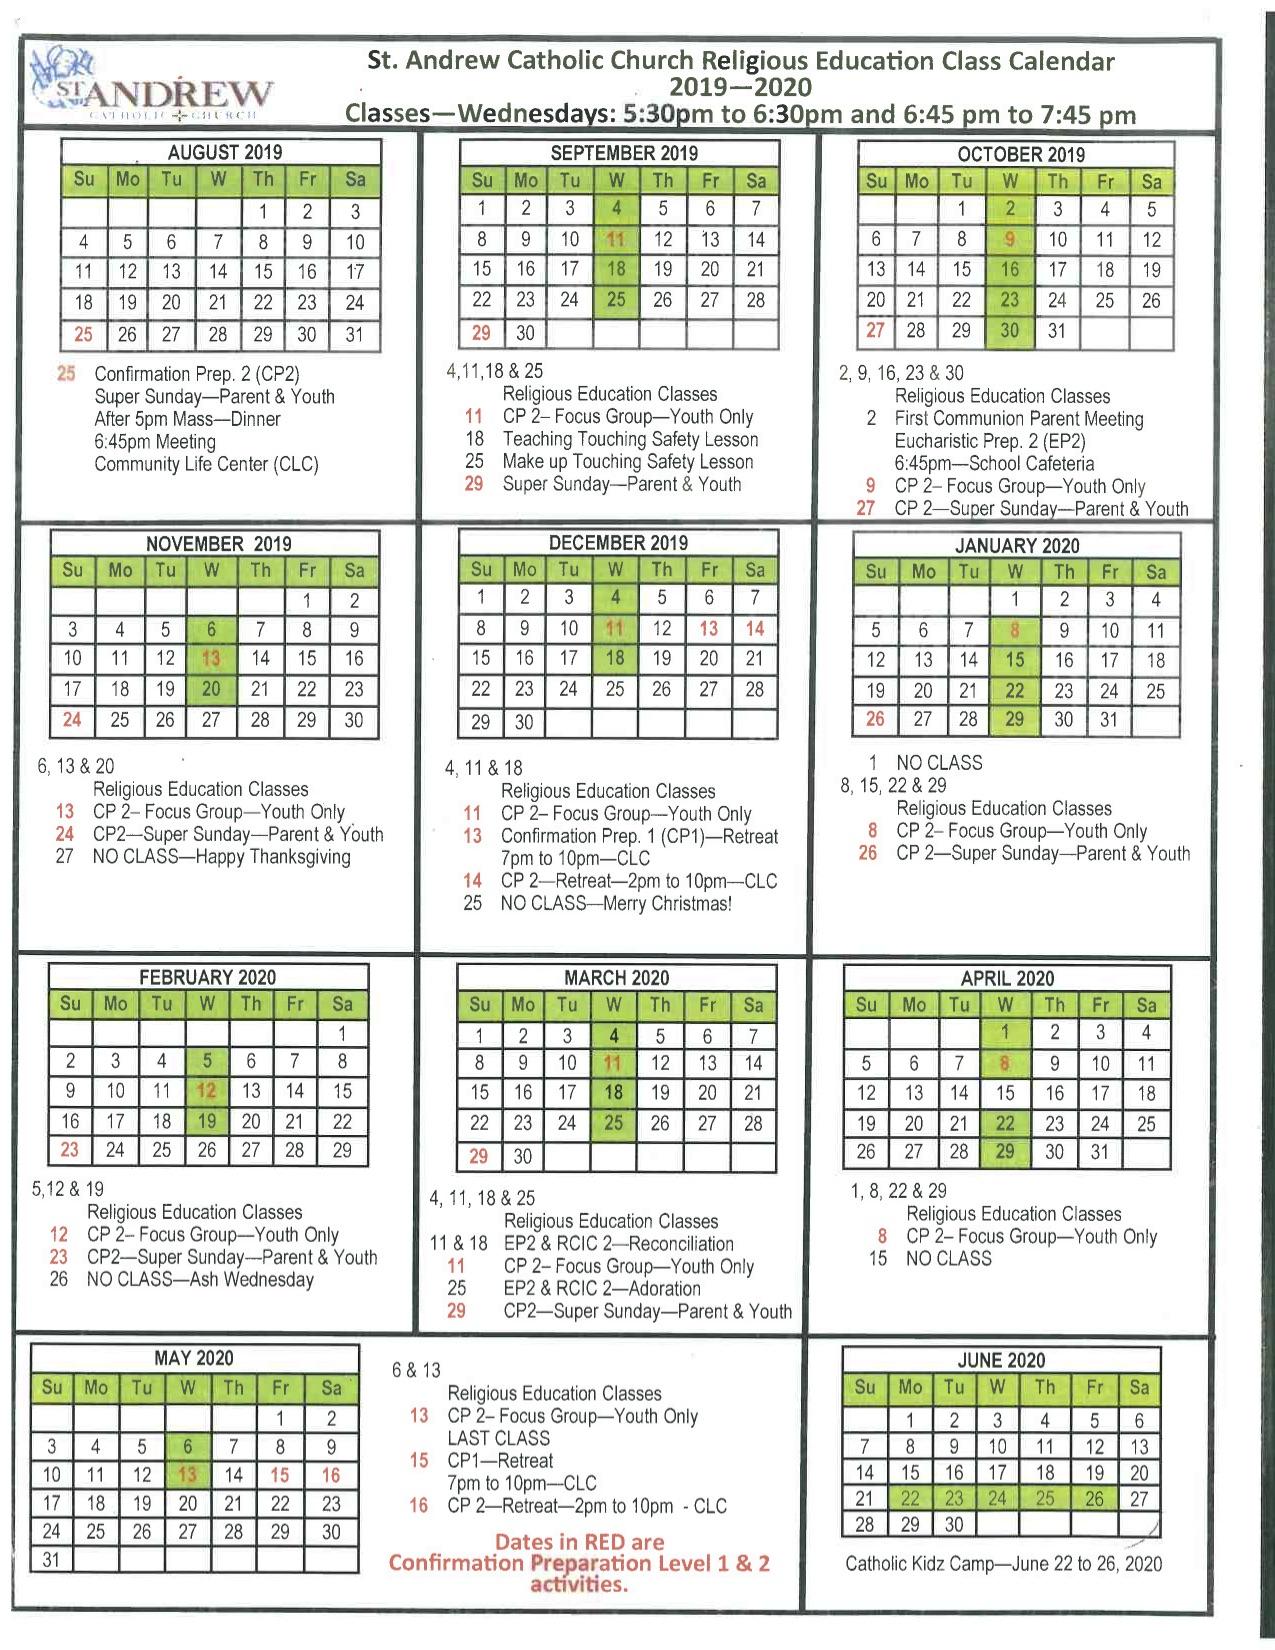 Liturgical Calendar - St. Andrew Catholic School for 2020 Catholic Liturgical Calendar Activities